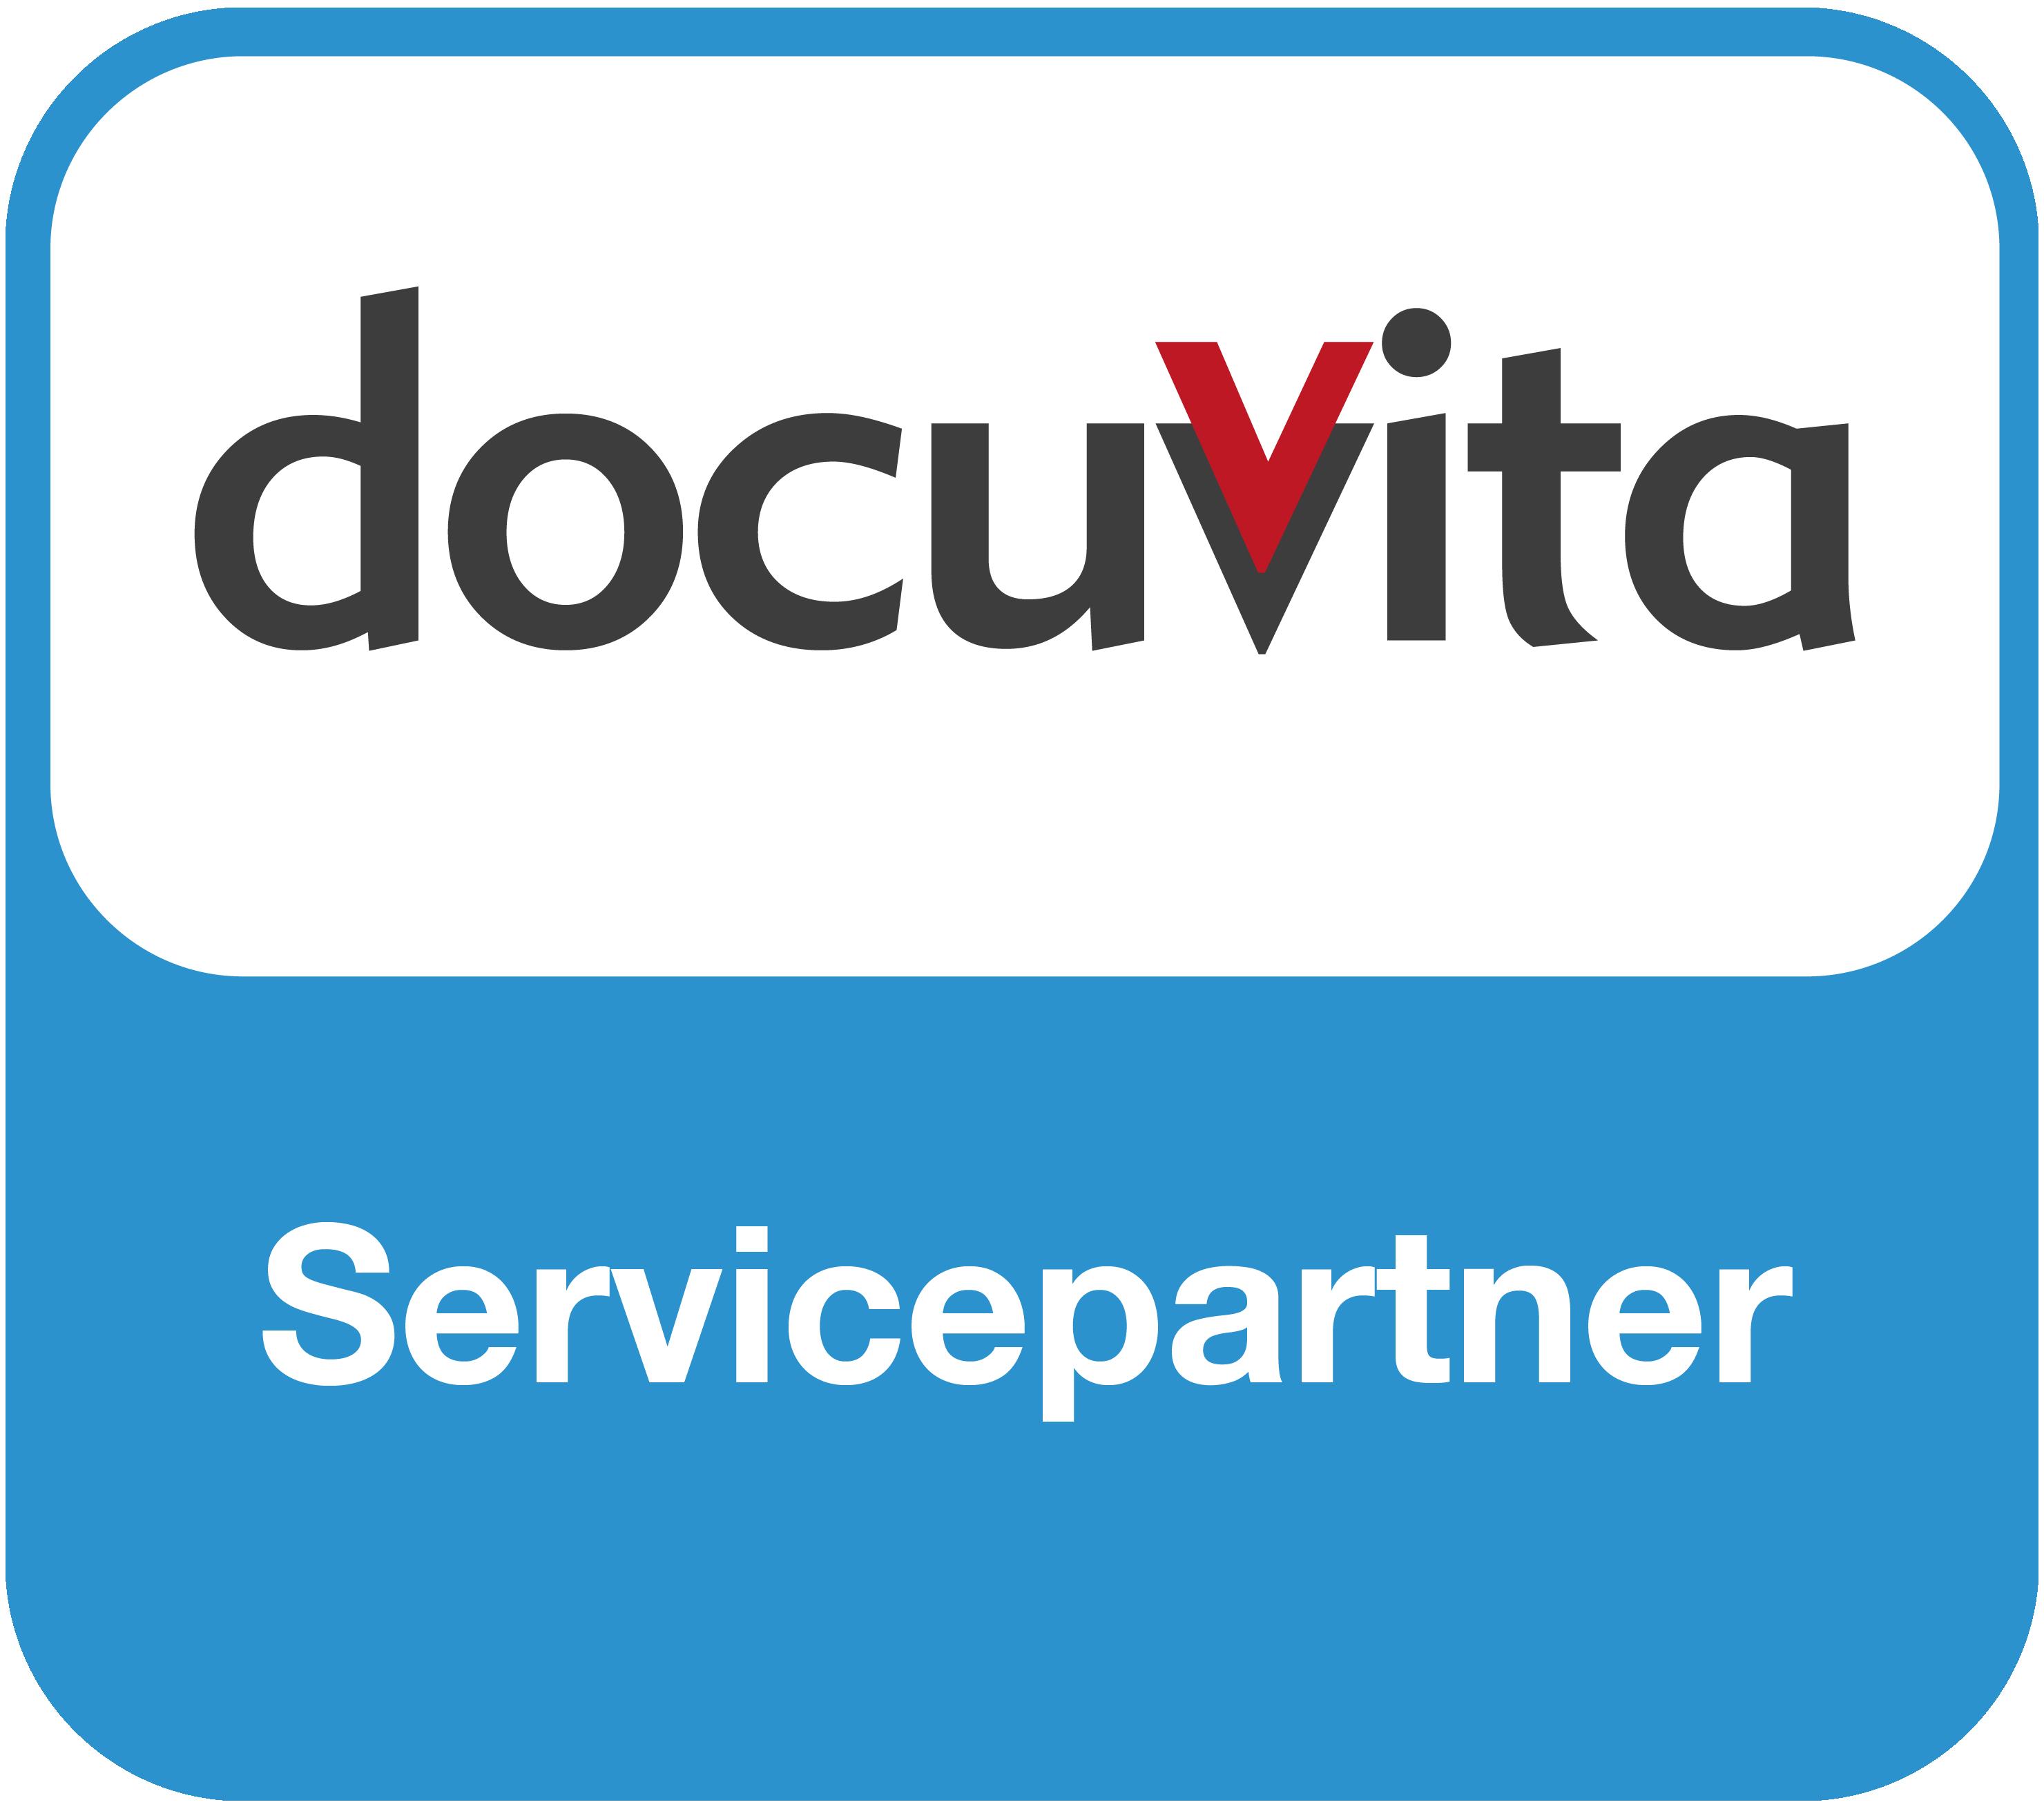 docuvita Servicepartner